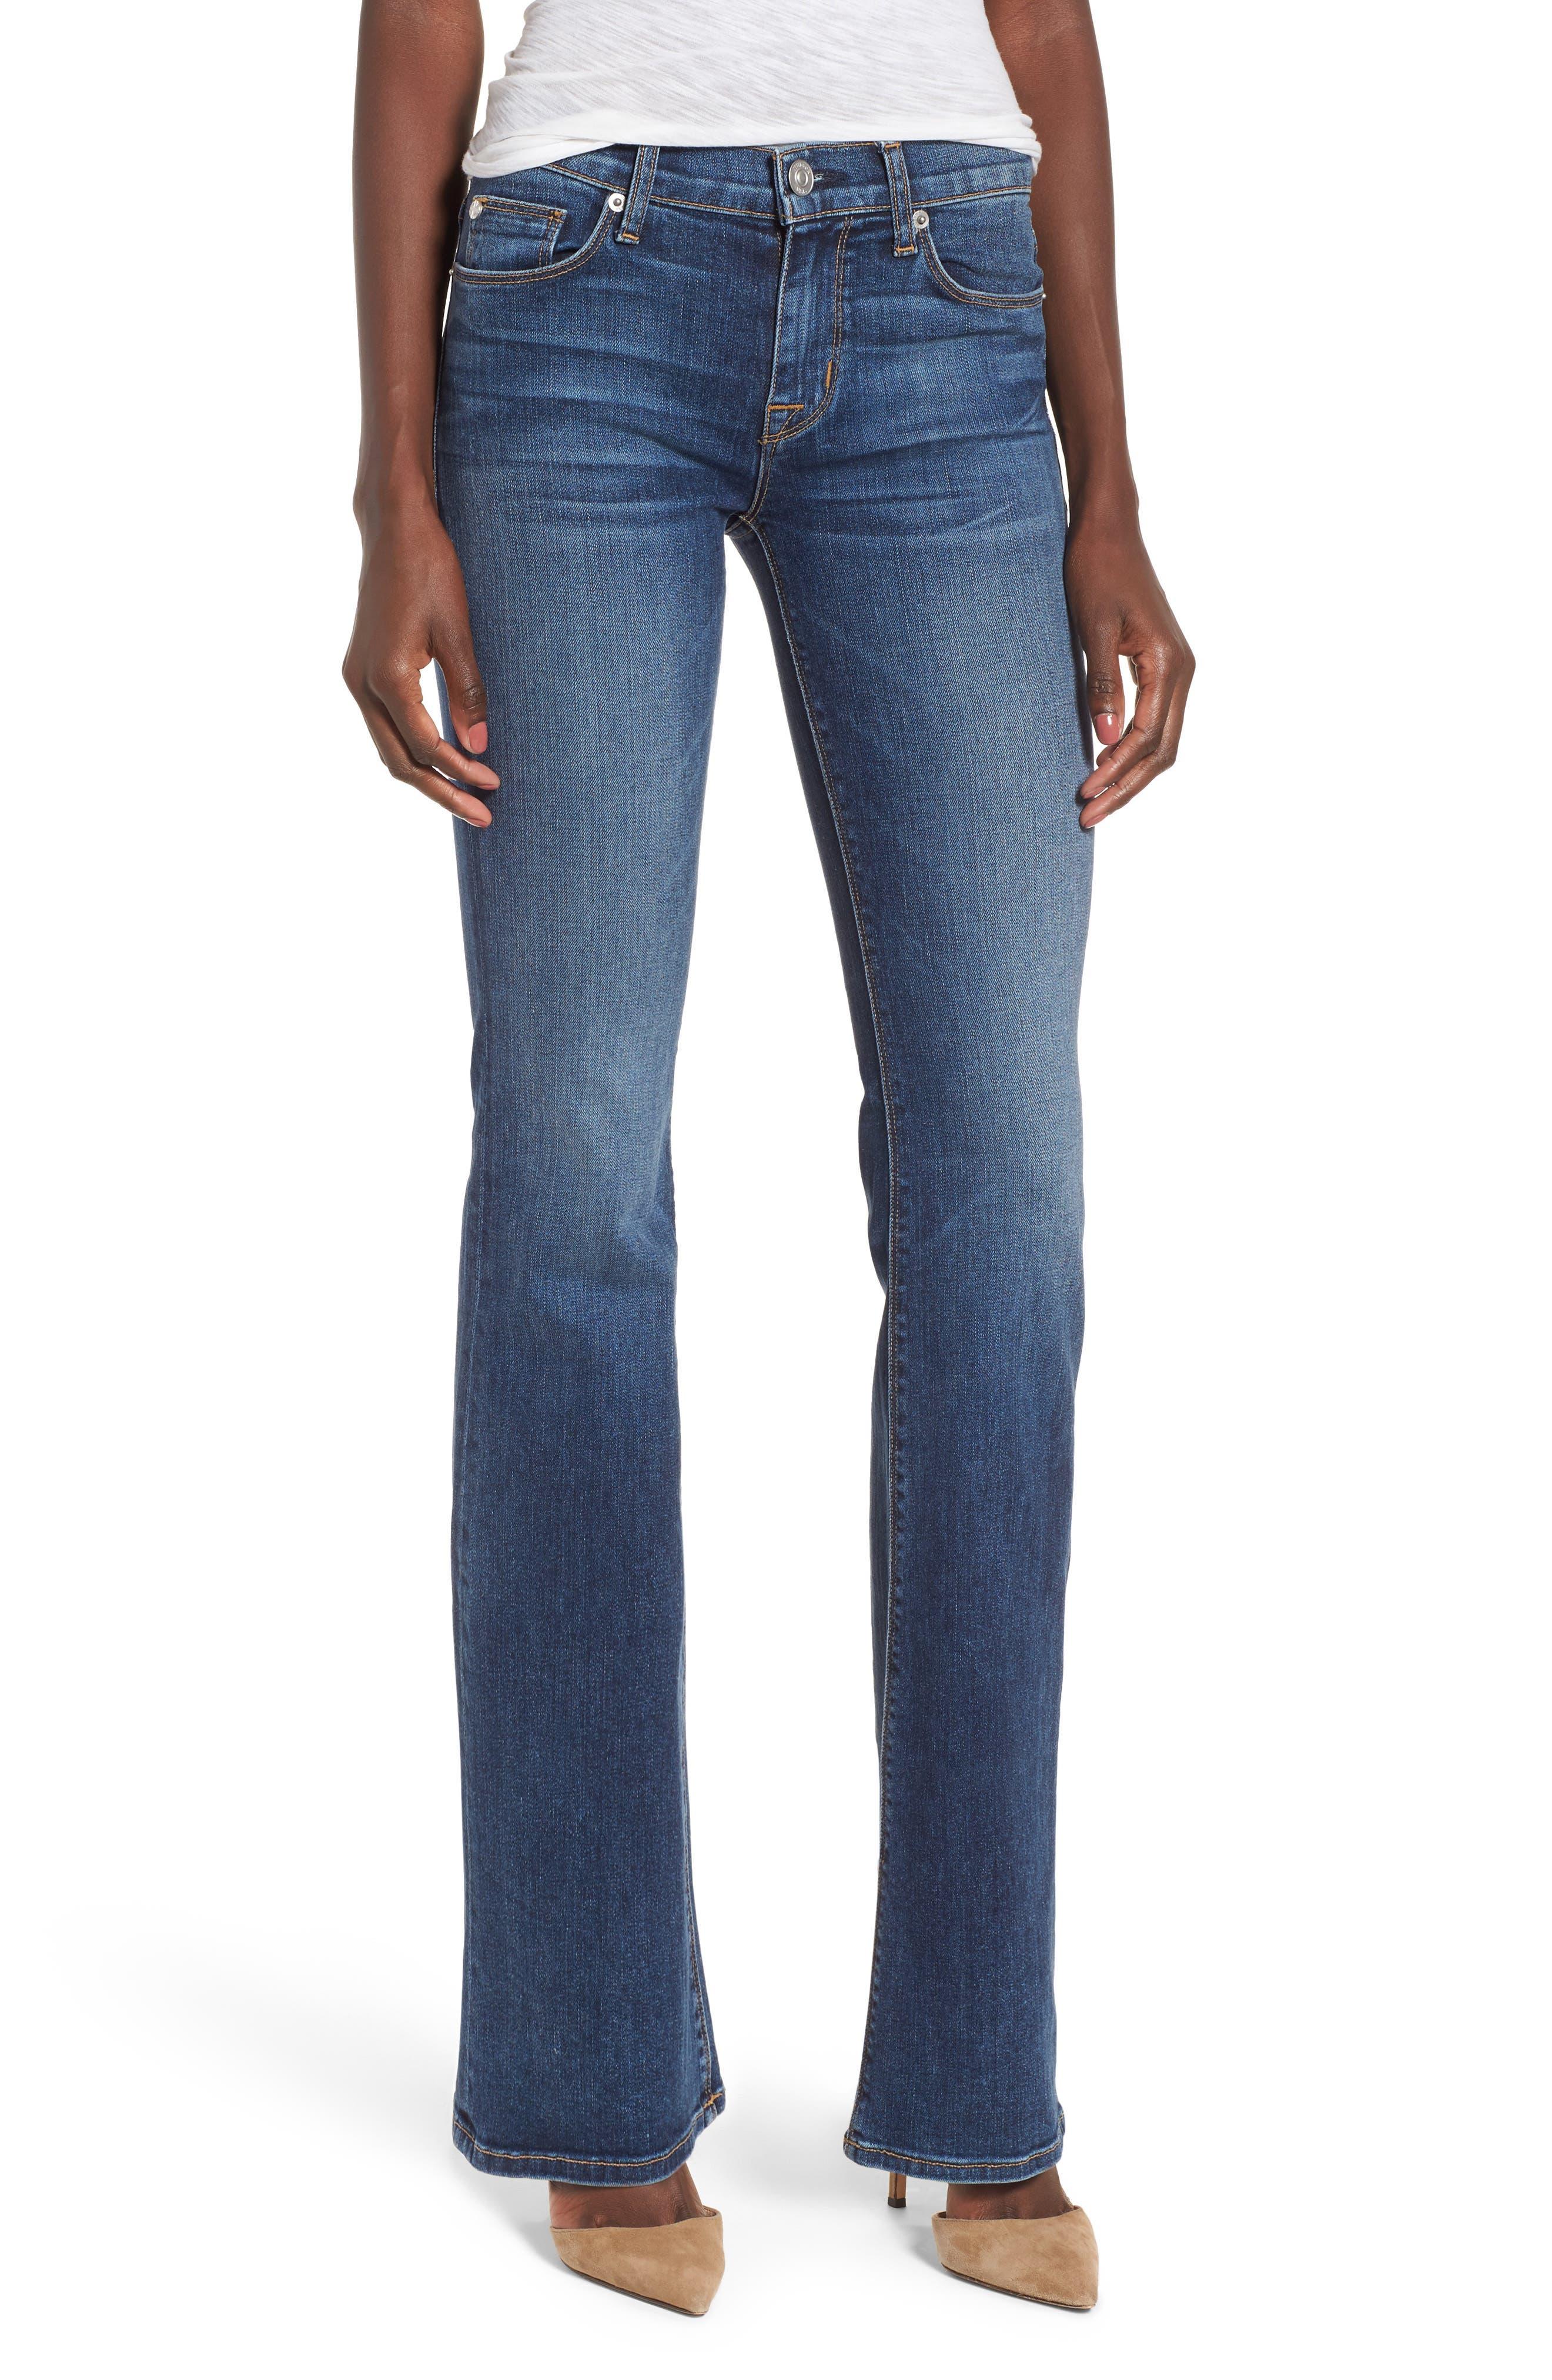 Alternate Image 1 Selected - Hudson Jeans Drew Bootcut Jeans (Unfamed)